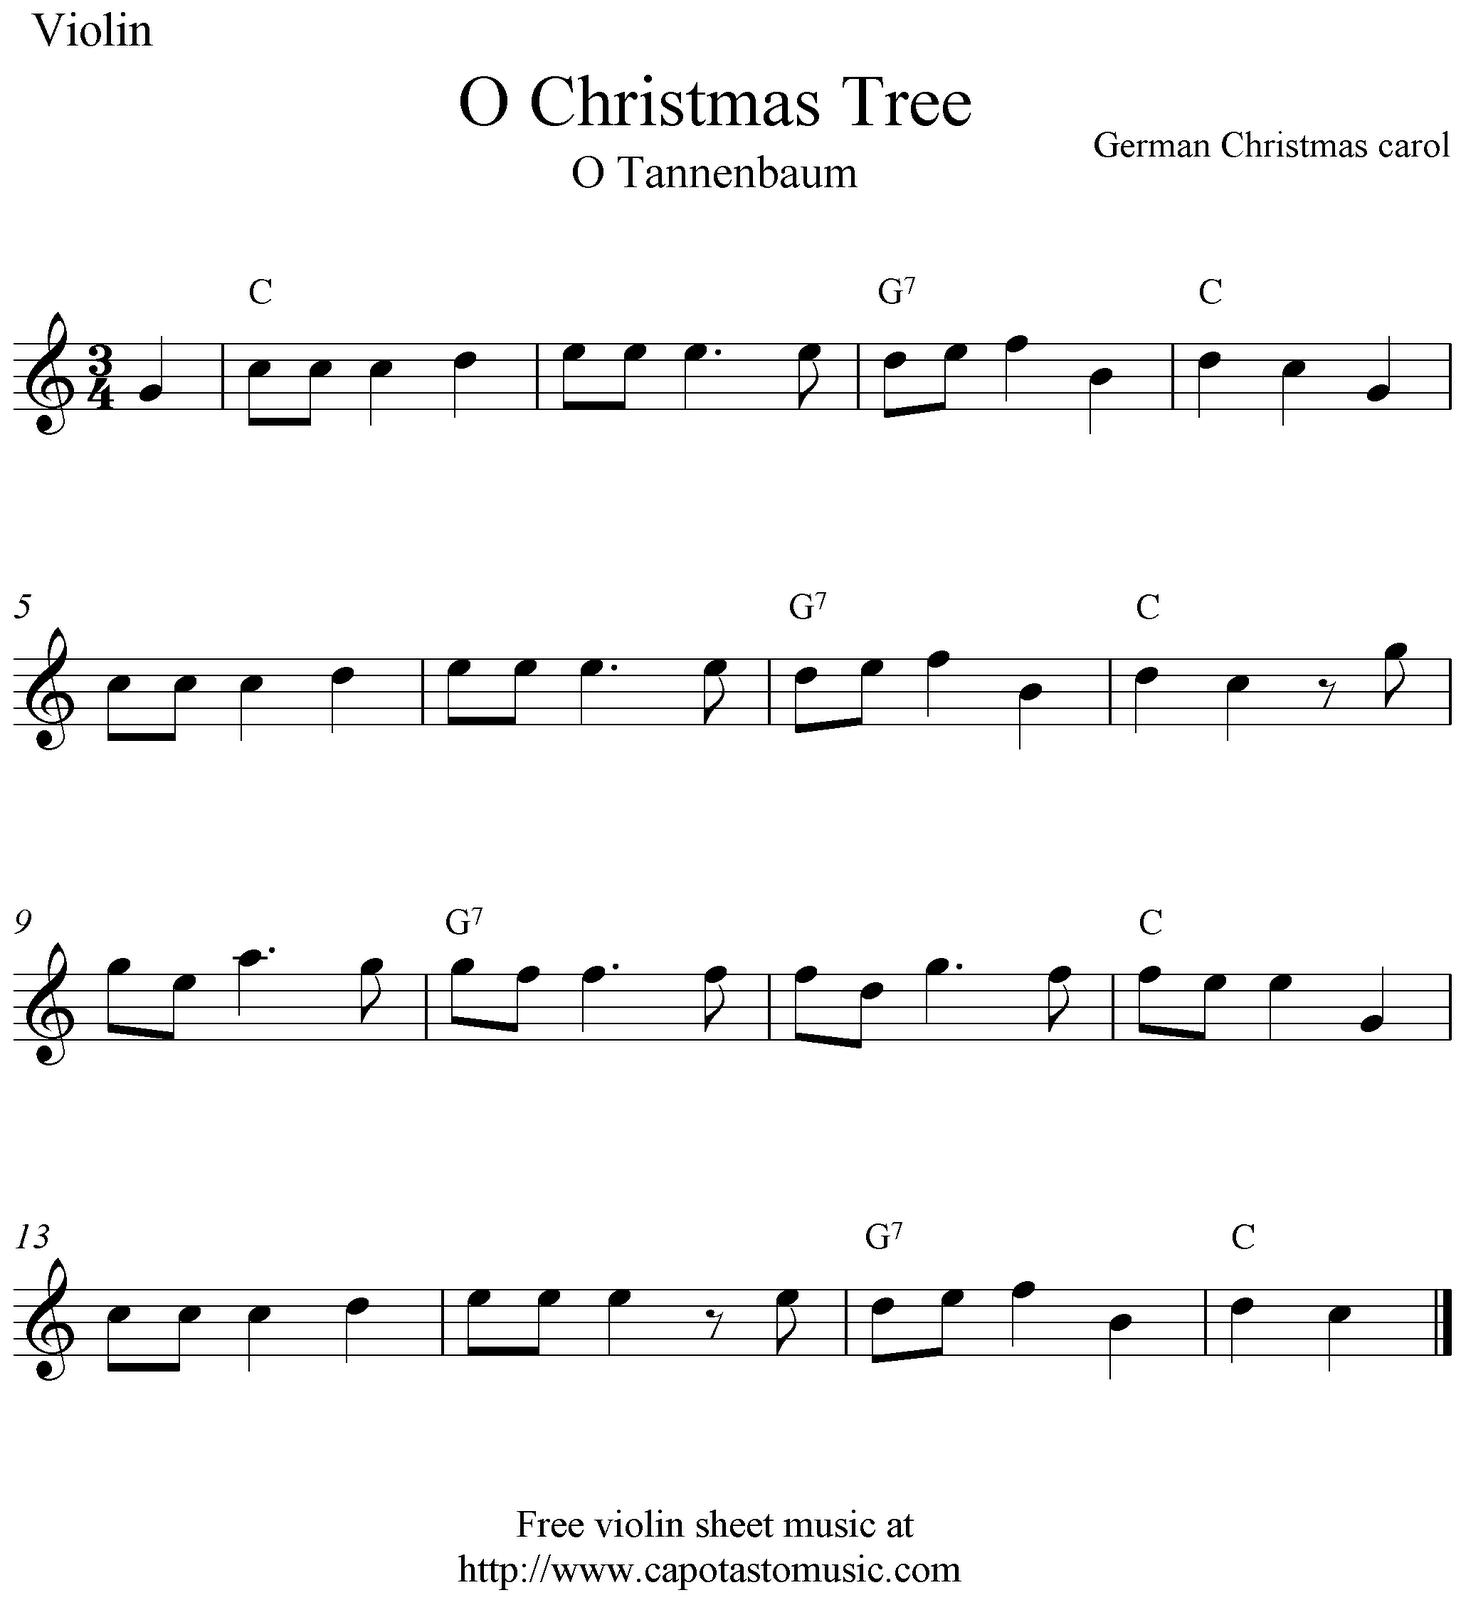 Images of O Christmas Tree Music - Home Design Ideas